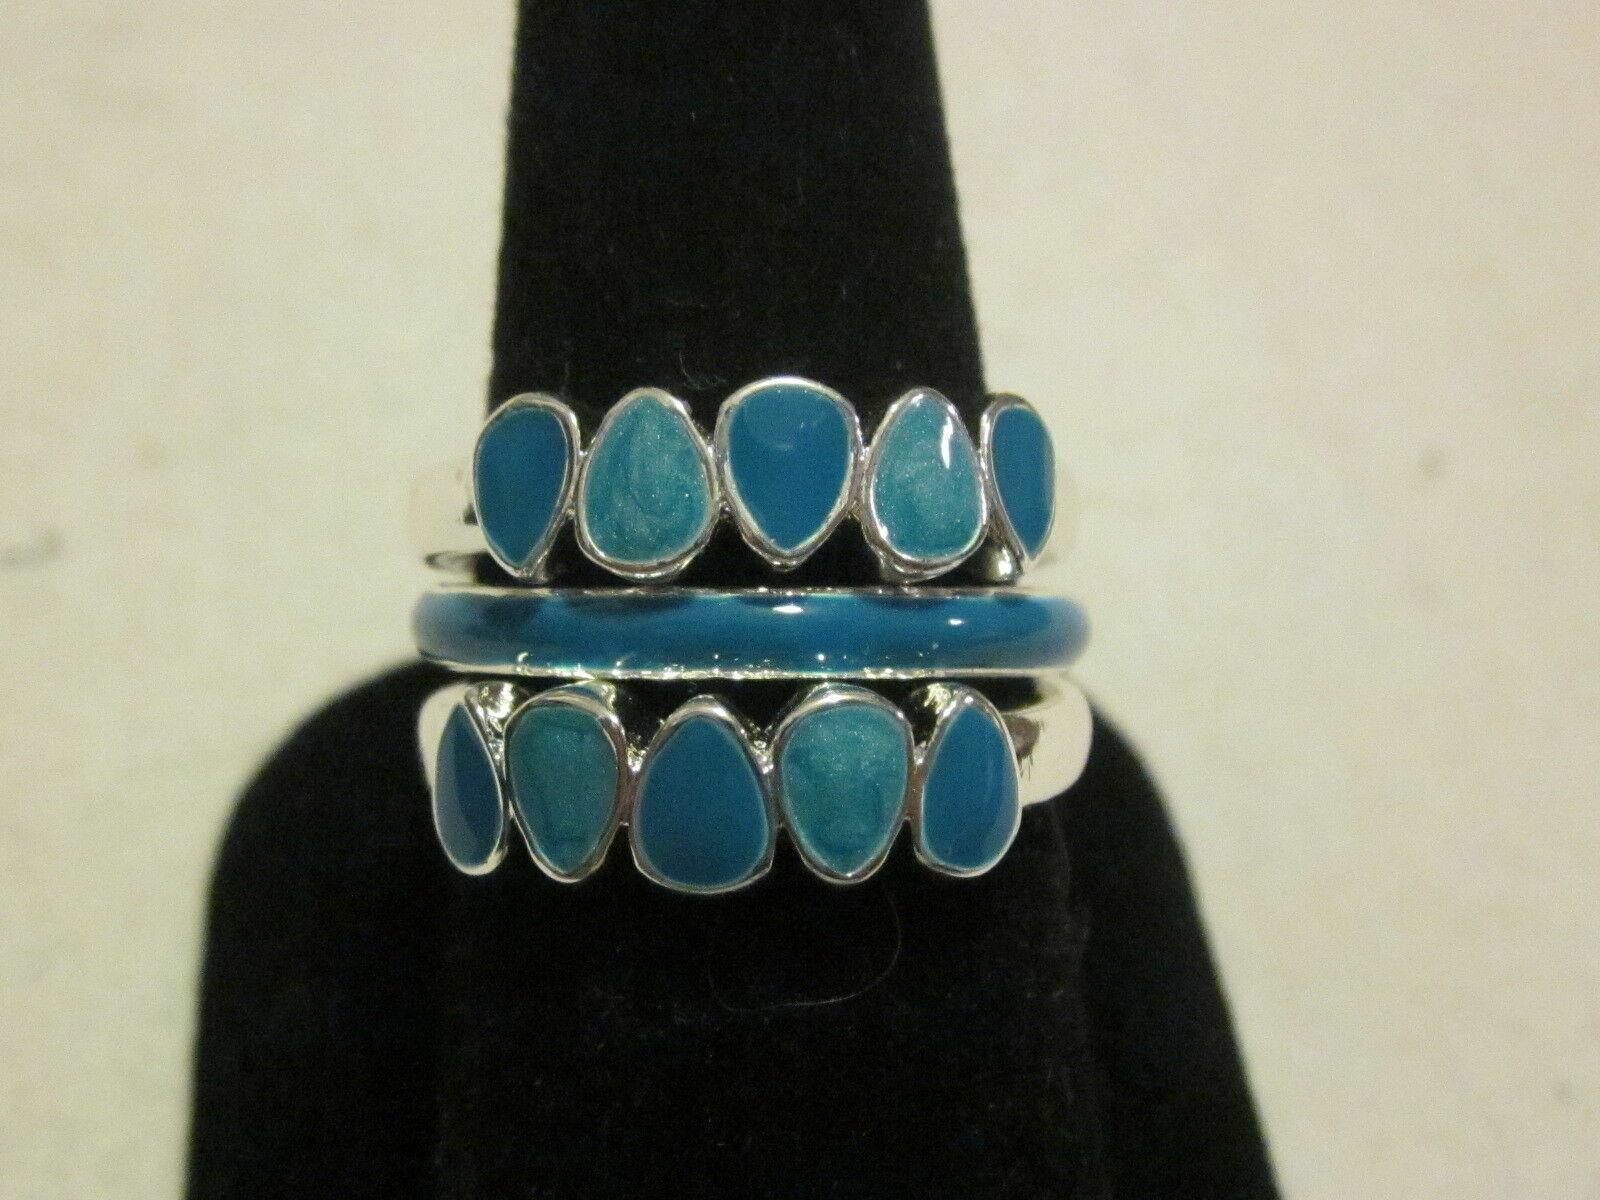 AVON Fragrant Garden Stackable Ring Set-Size 8